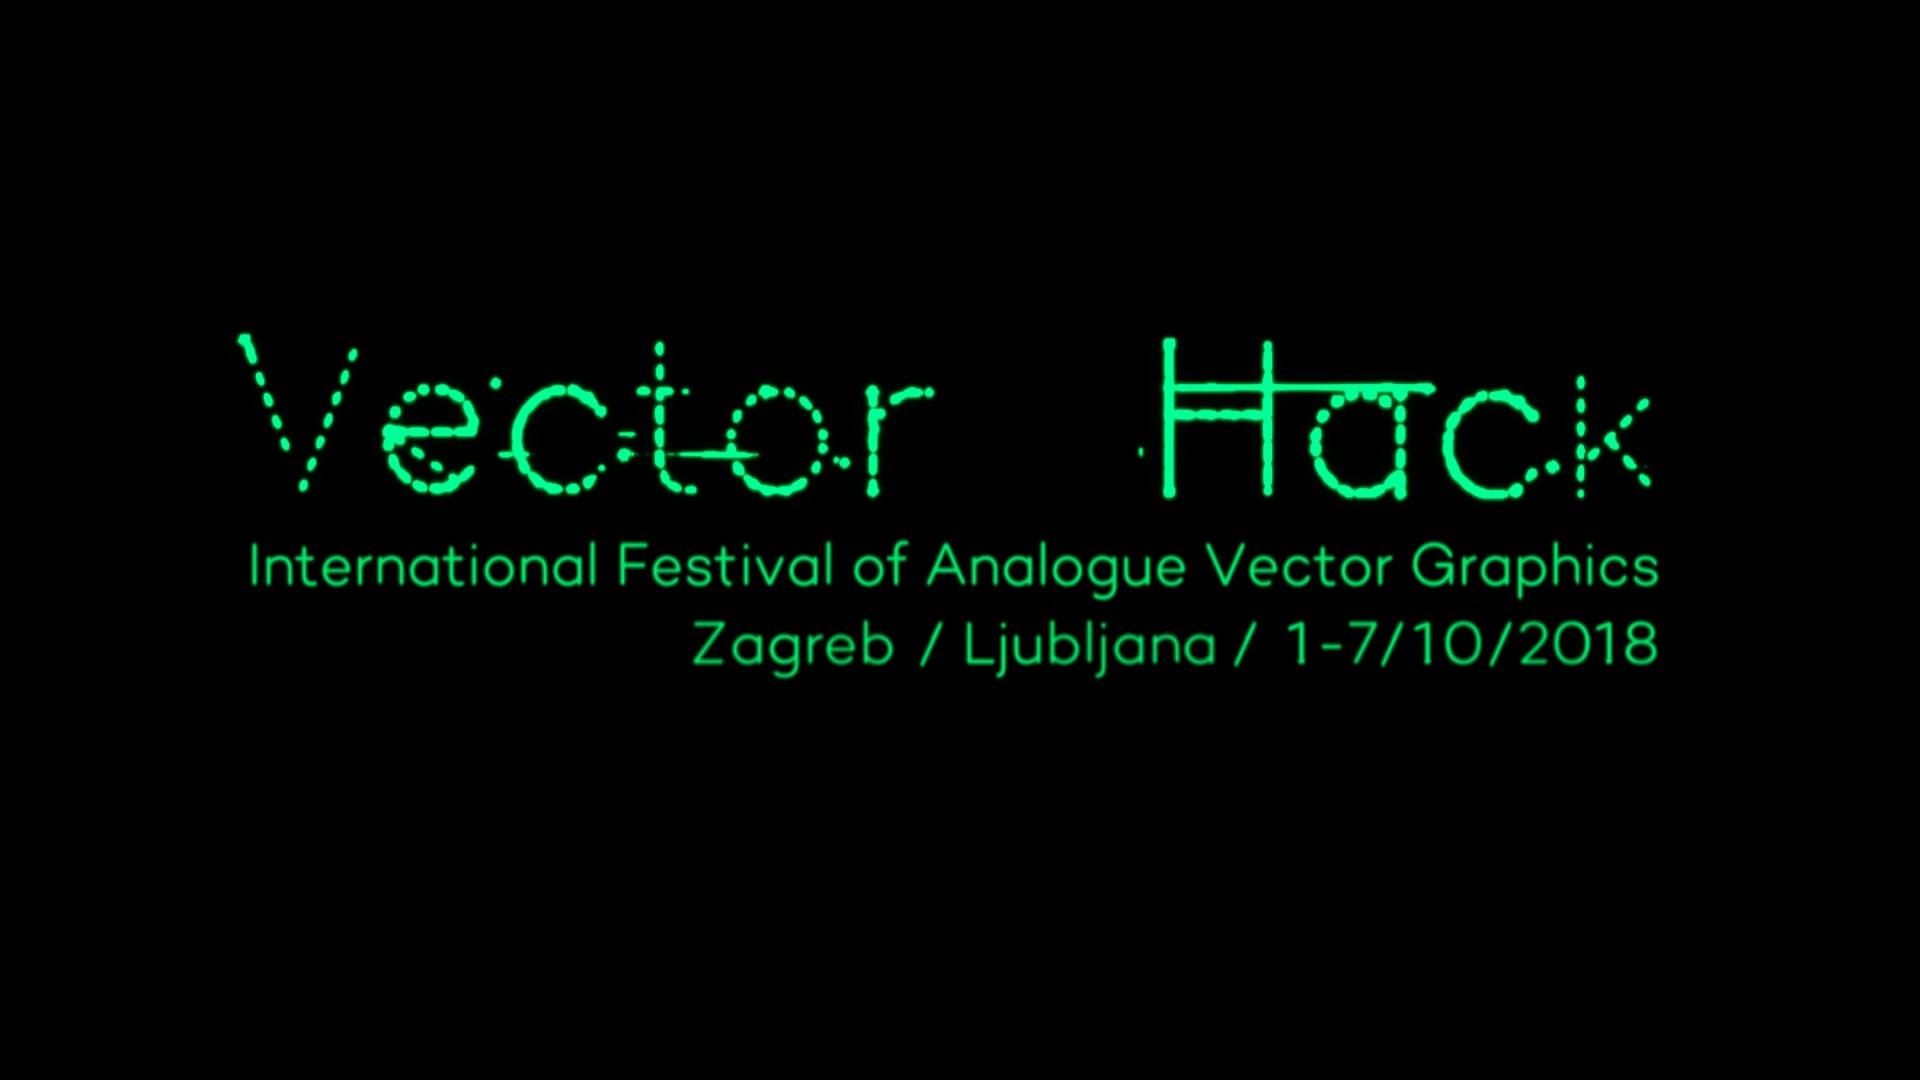 1920x1080 Vector Hack Festival 2018 Radiona